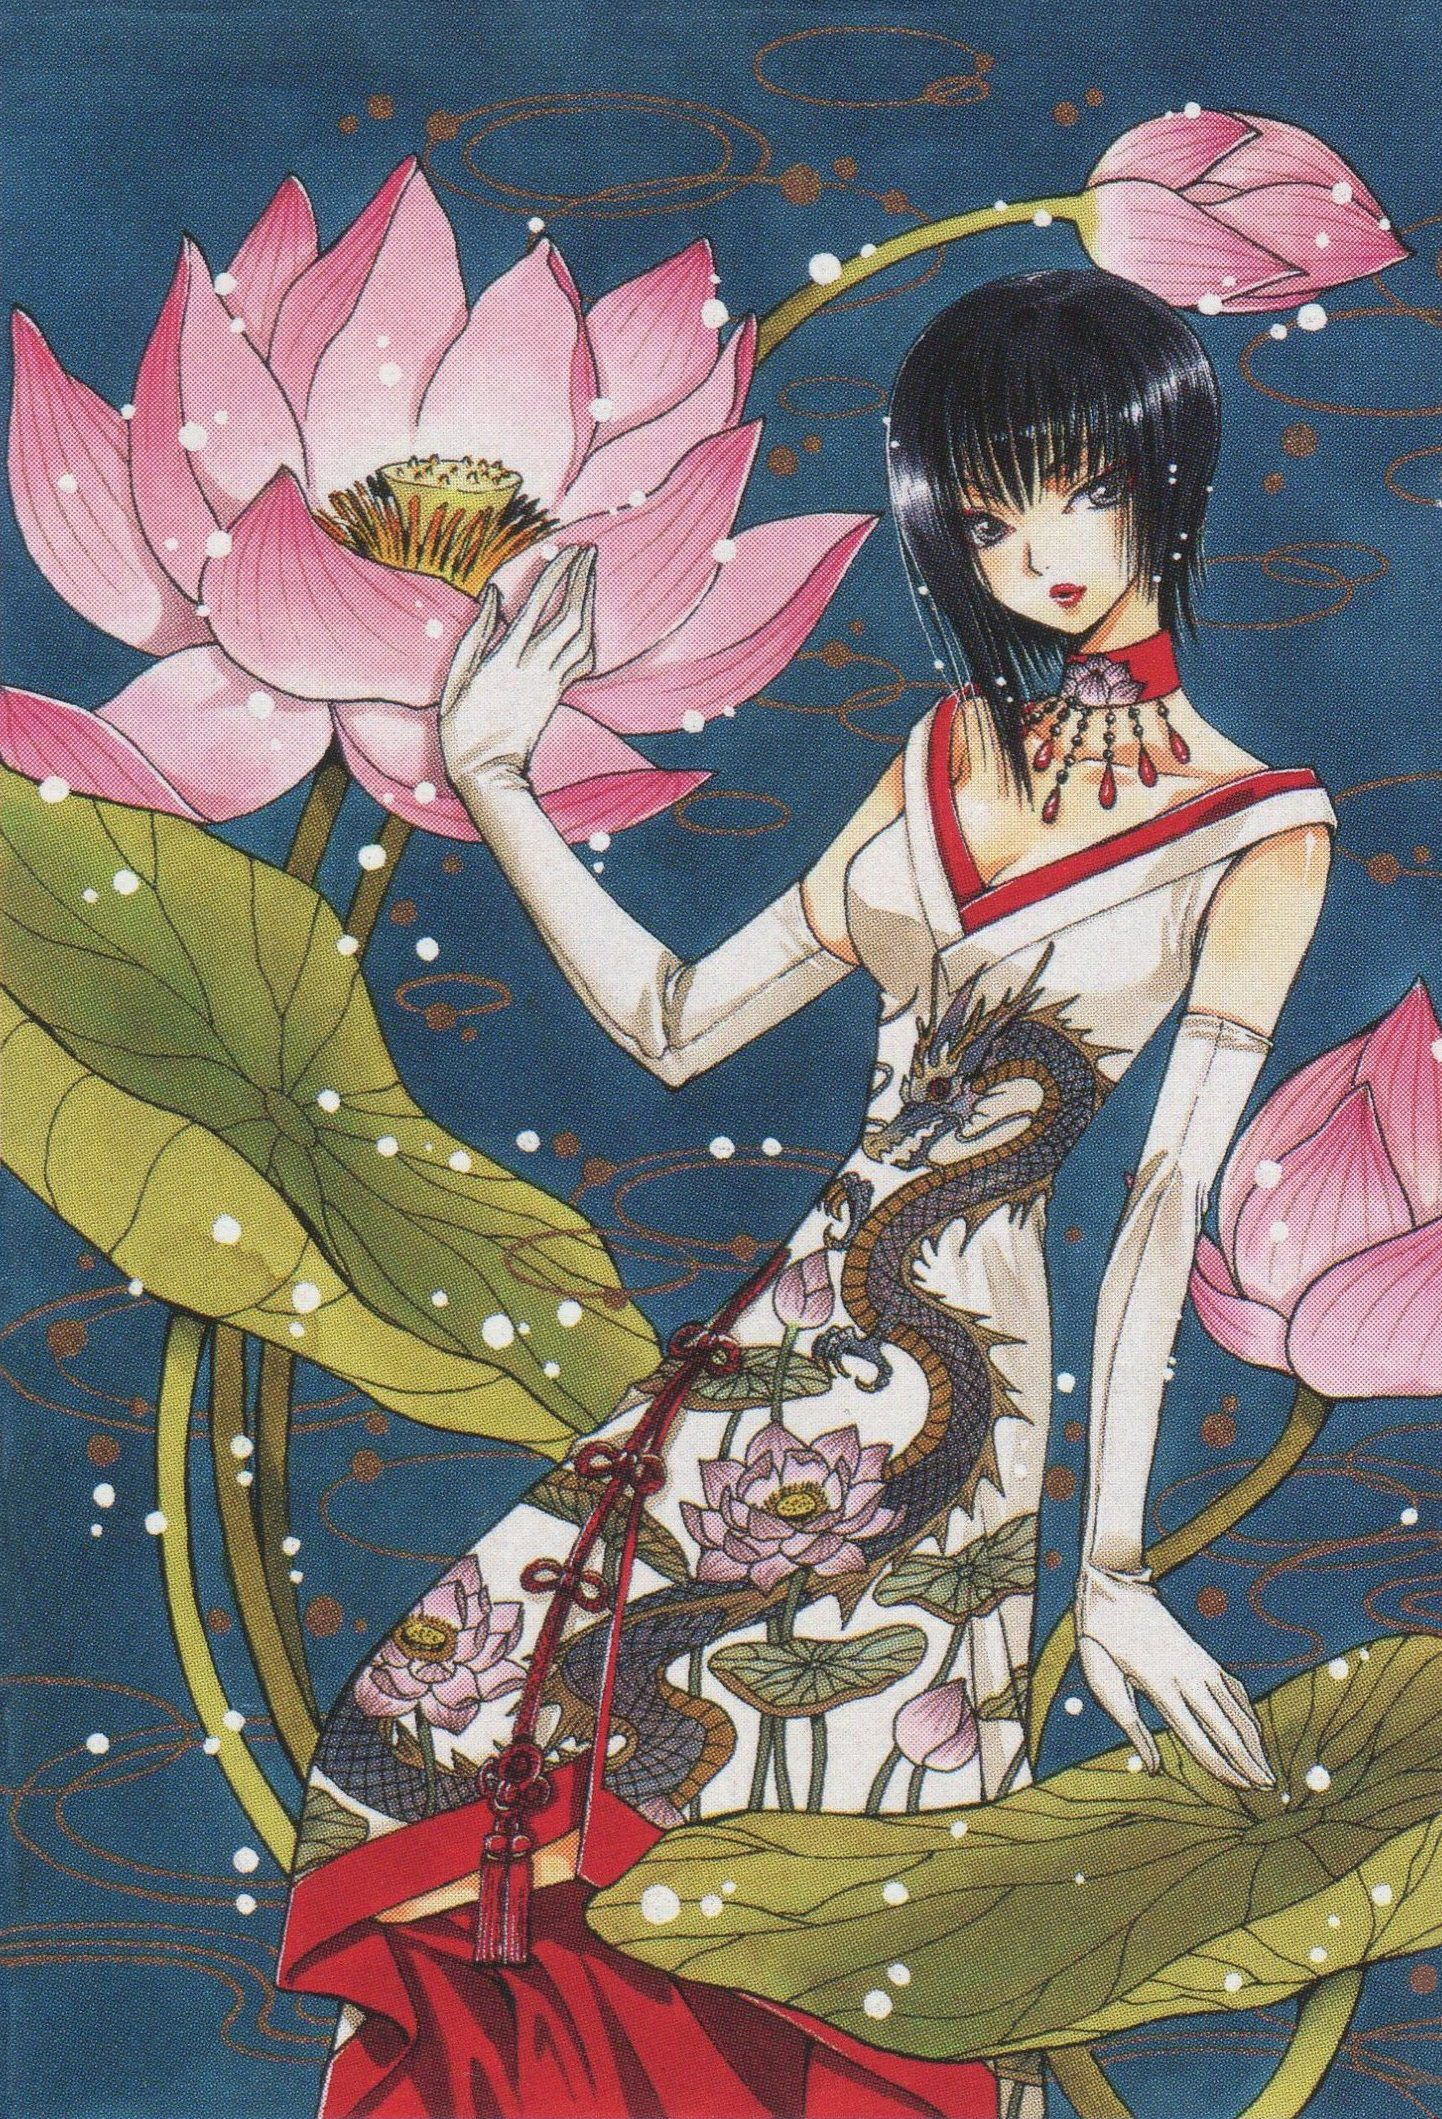 Download CLAMP (1442x2119) Minitokyo Manga